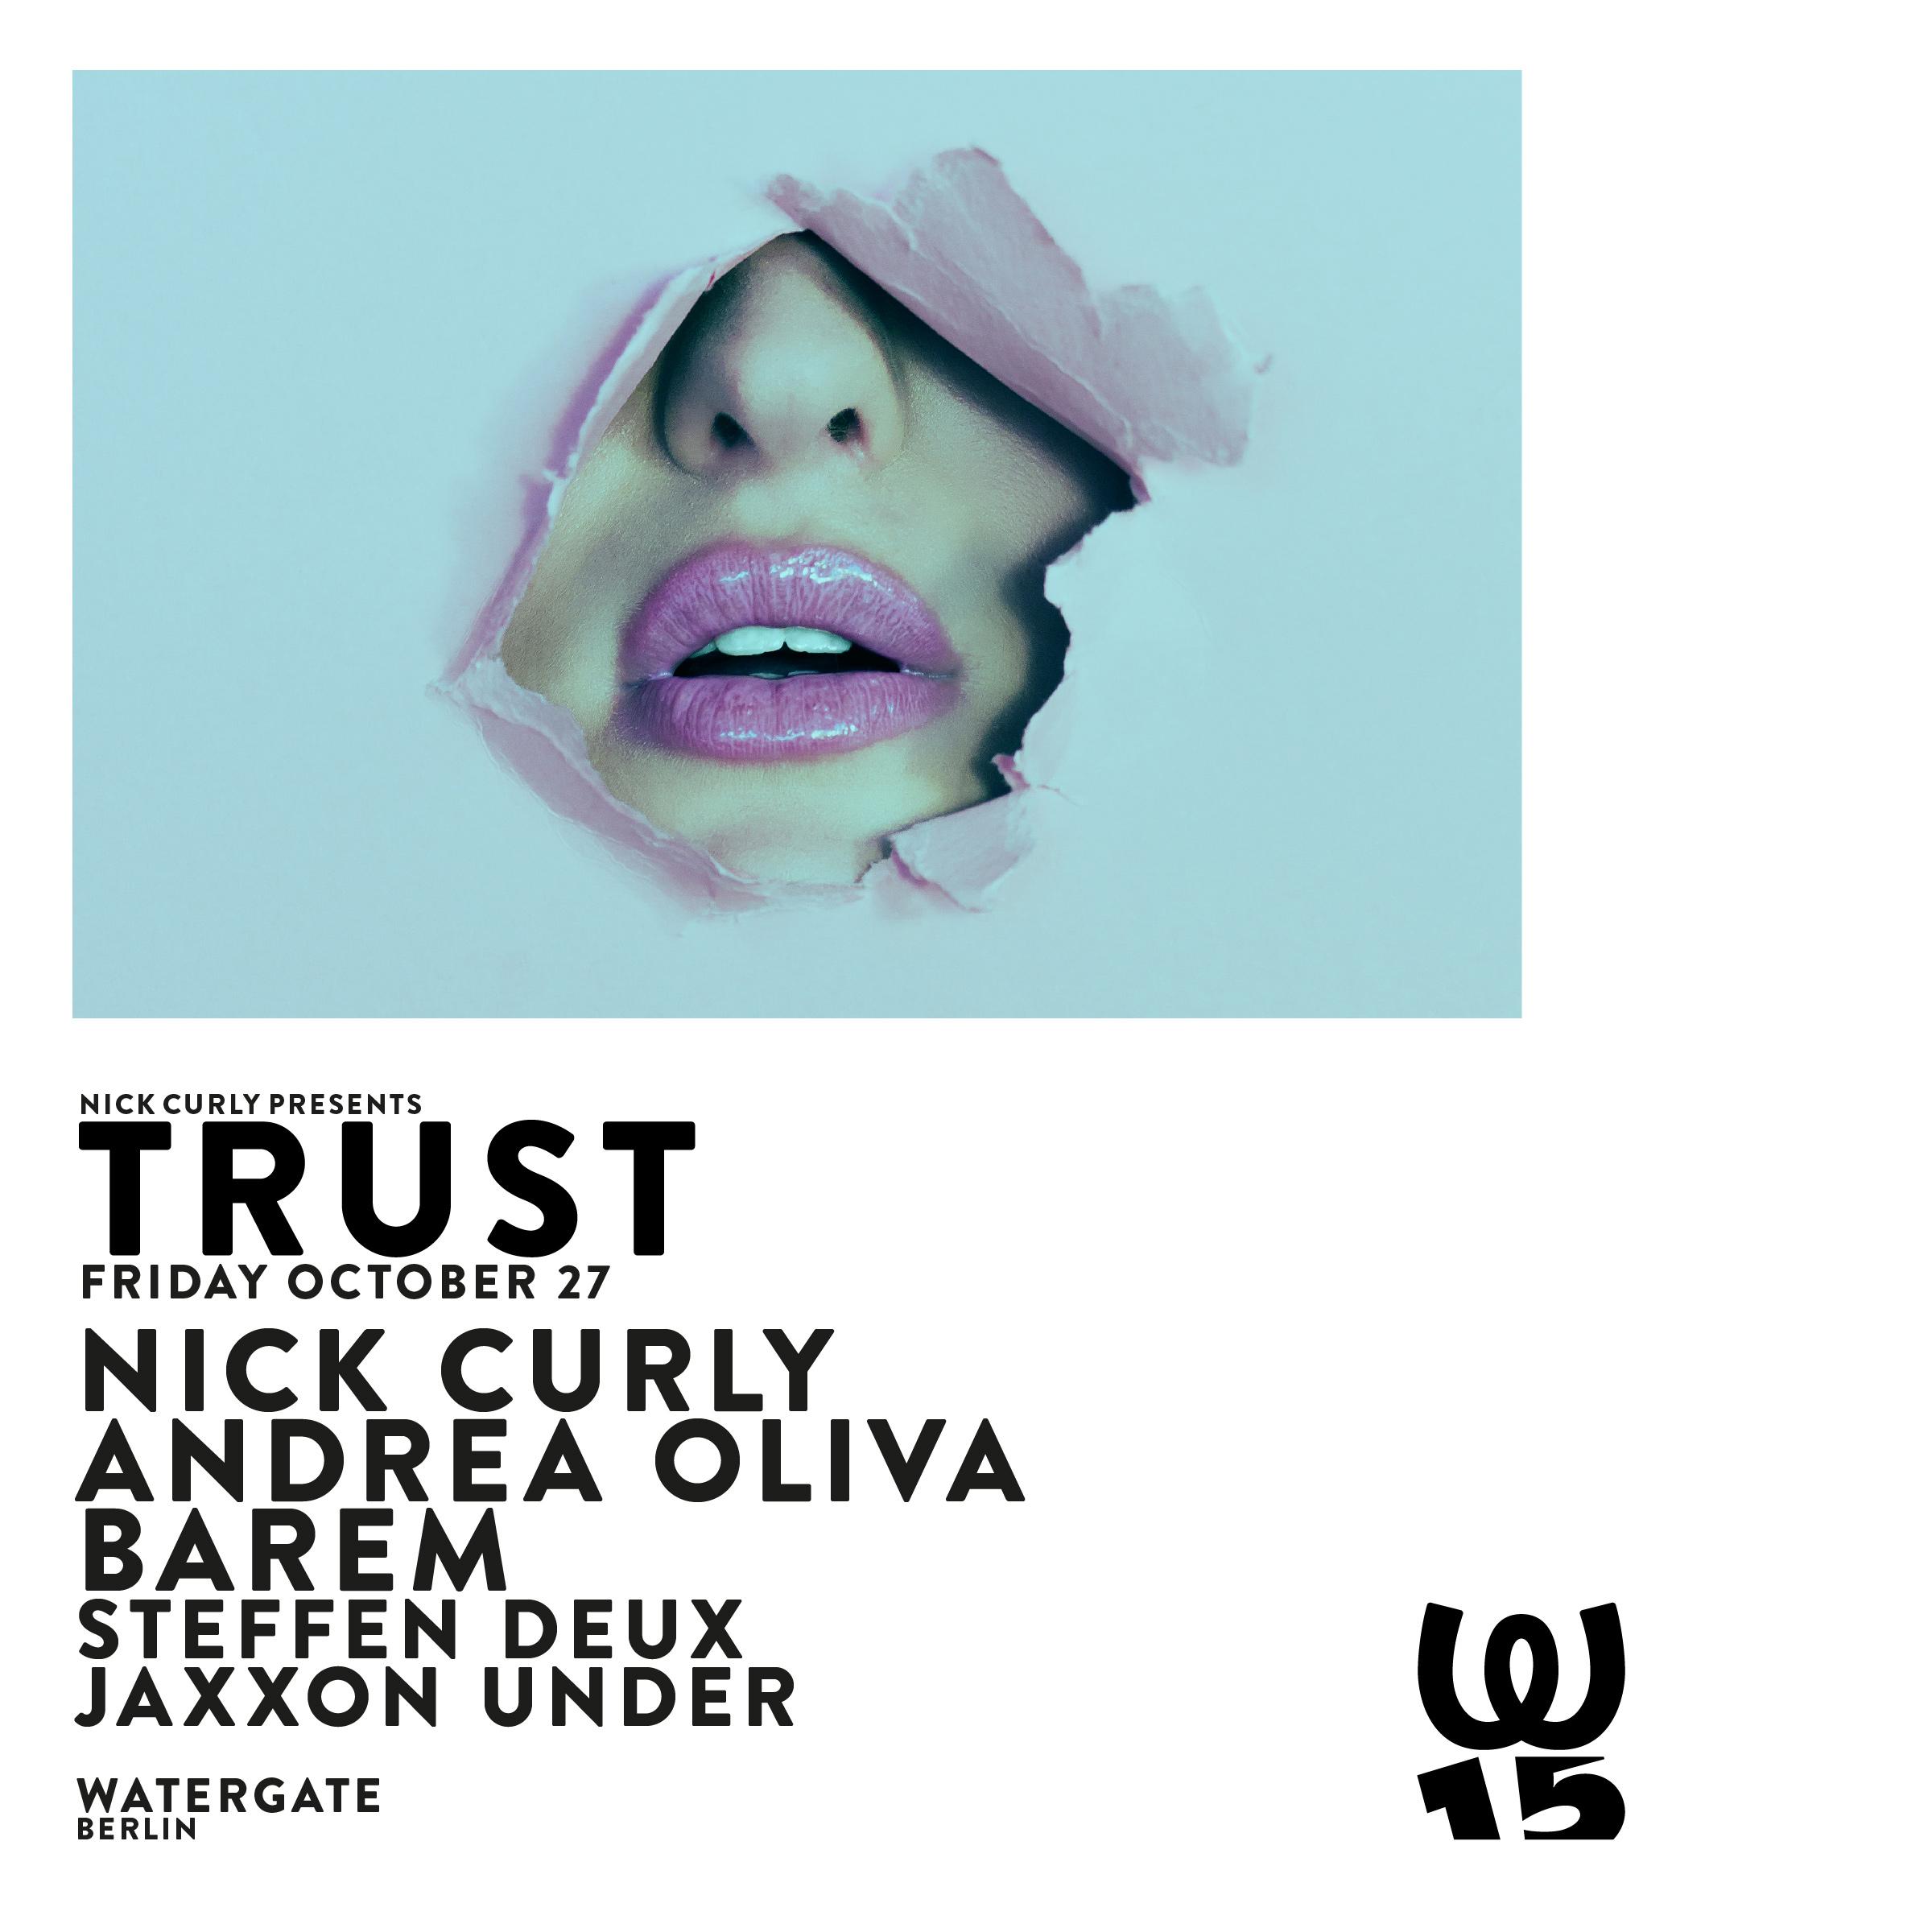 Nick Curly presents Trust